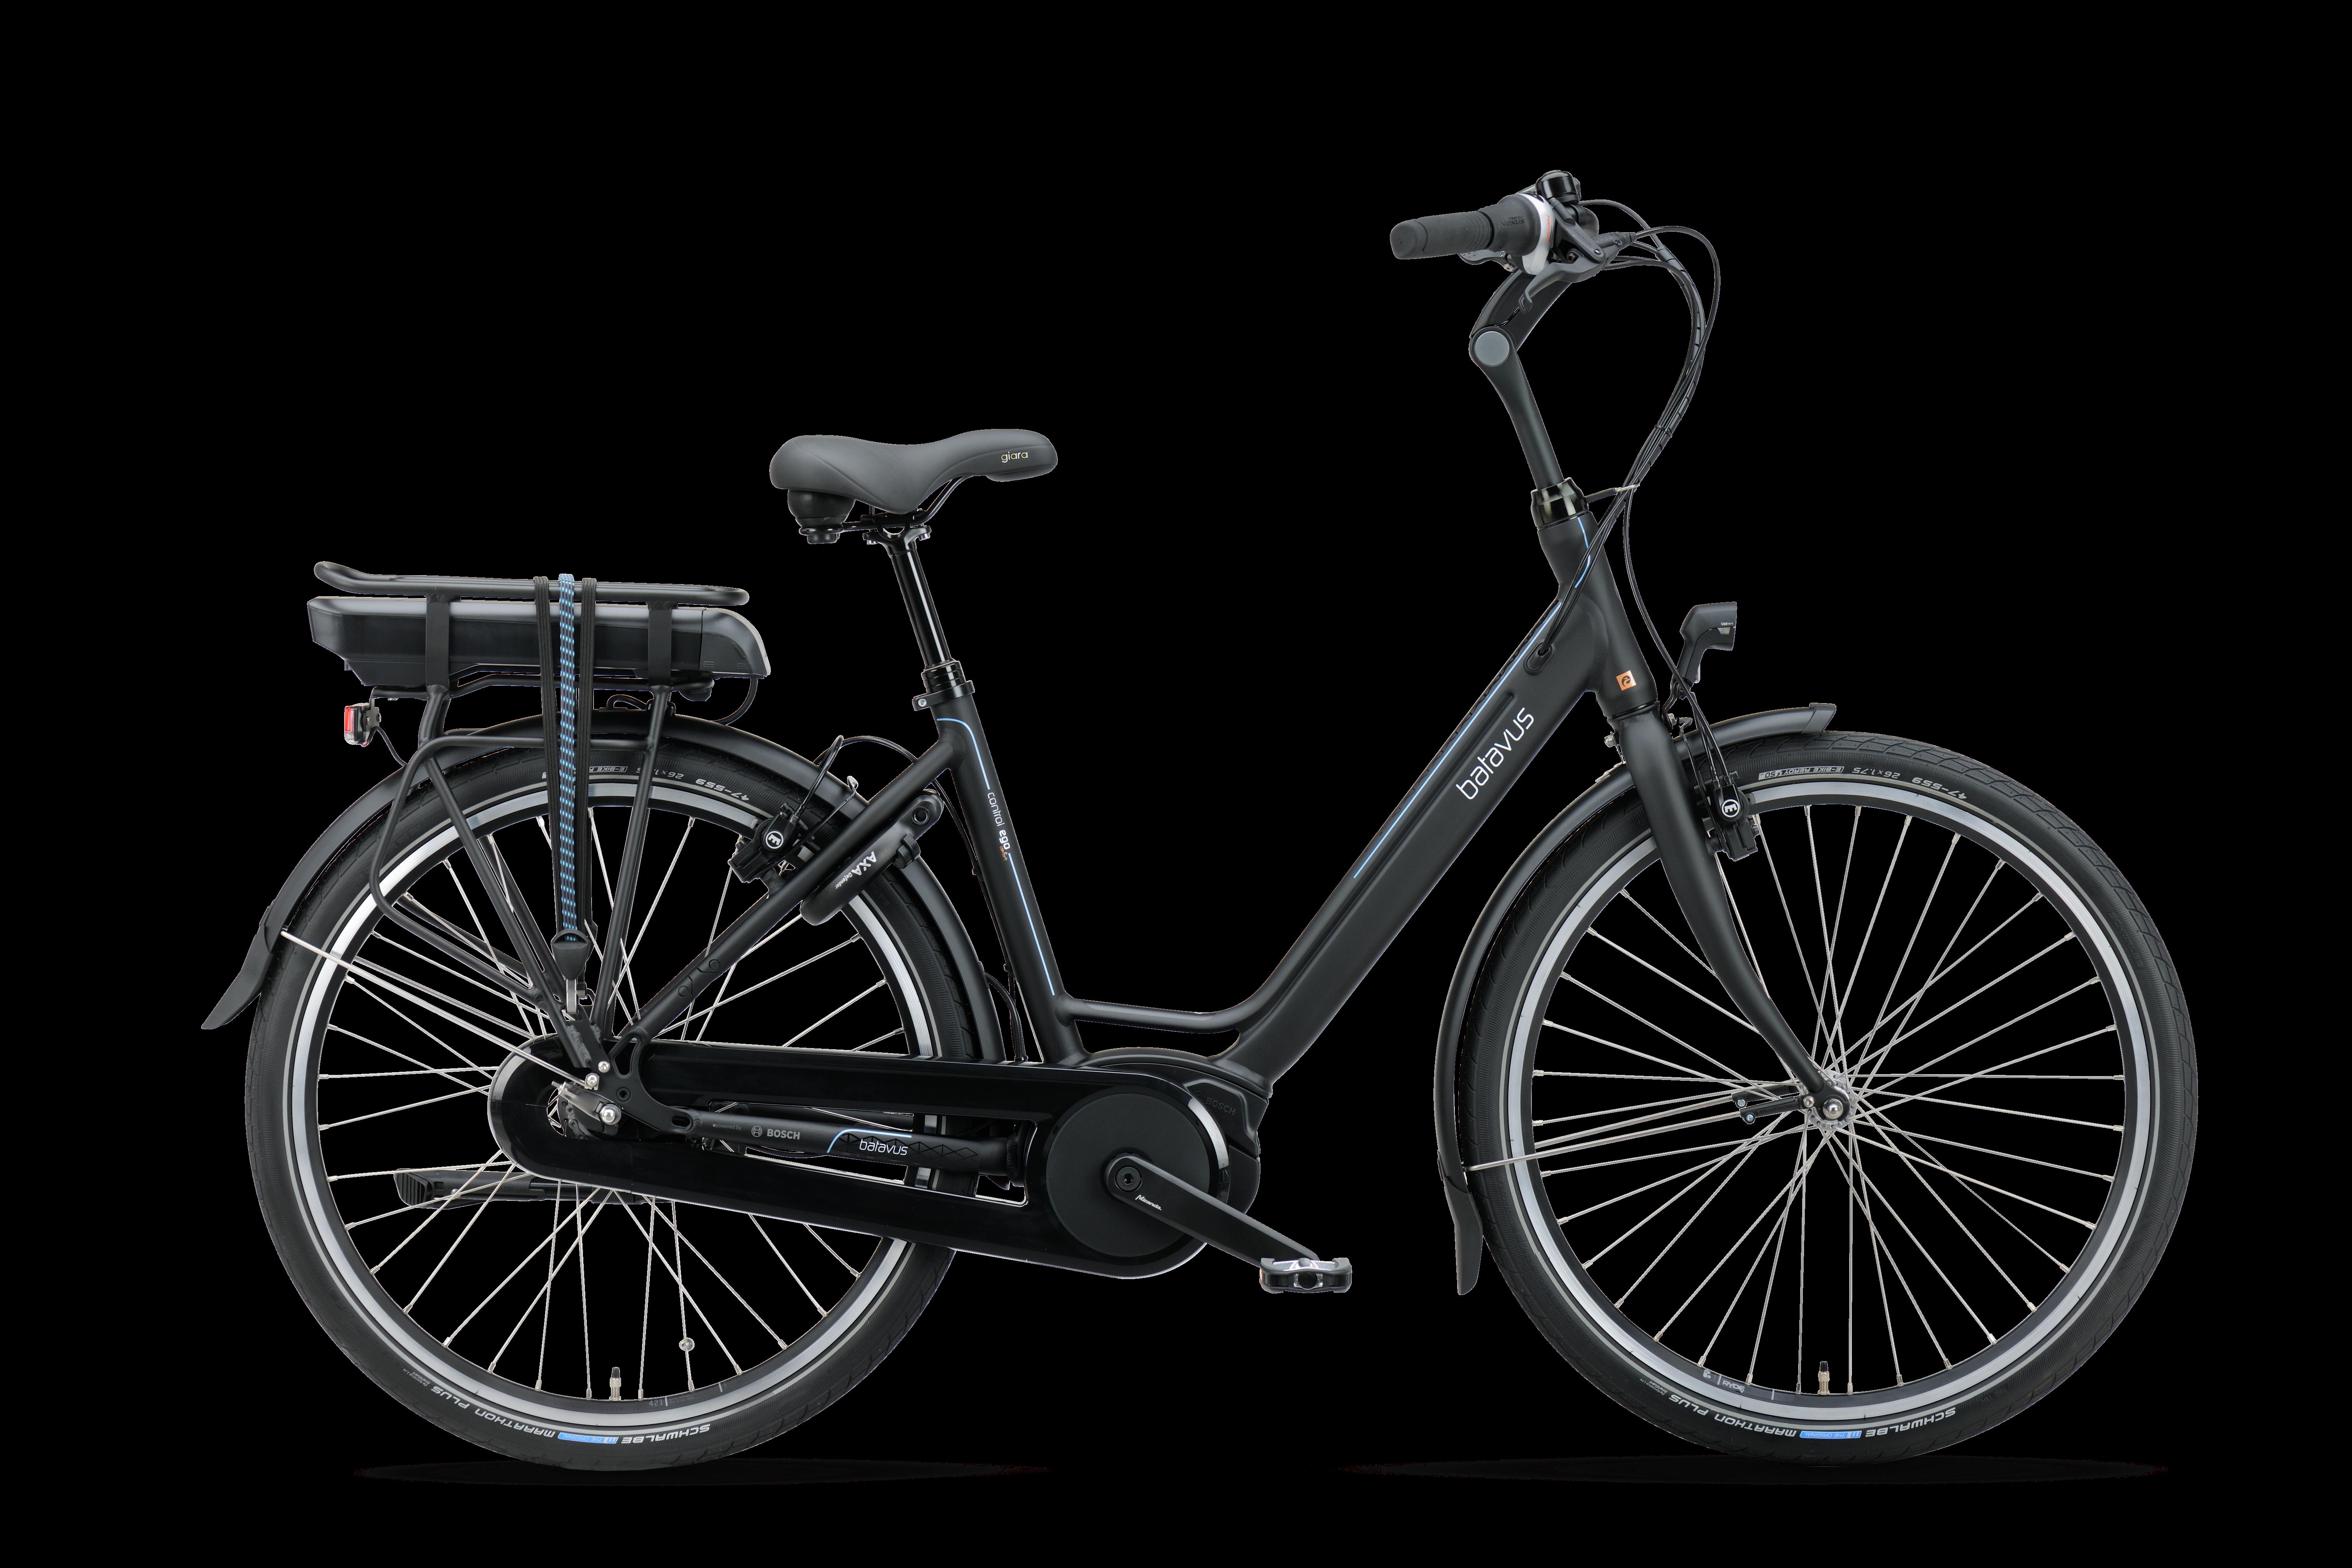 Lichte Elektrische Fiets : Batavus de elektrische fiets